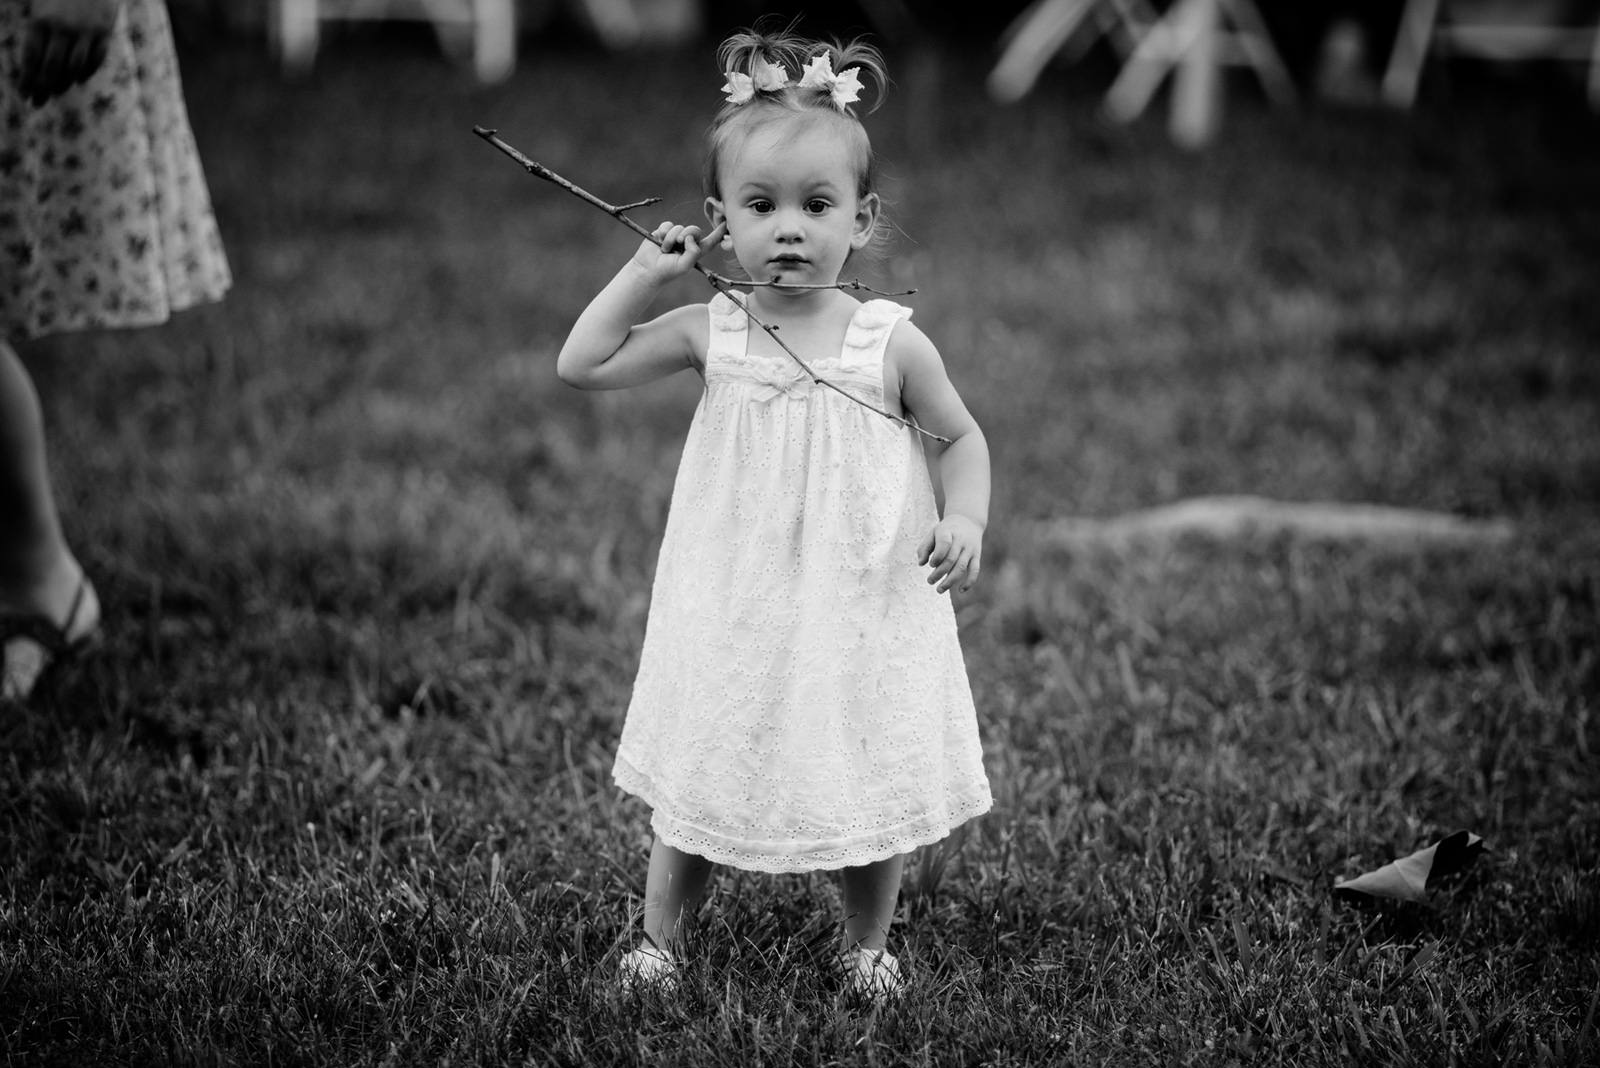 little girl finds stick